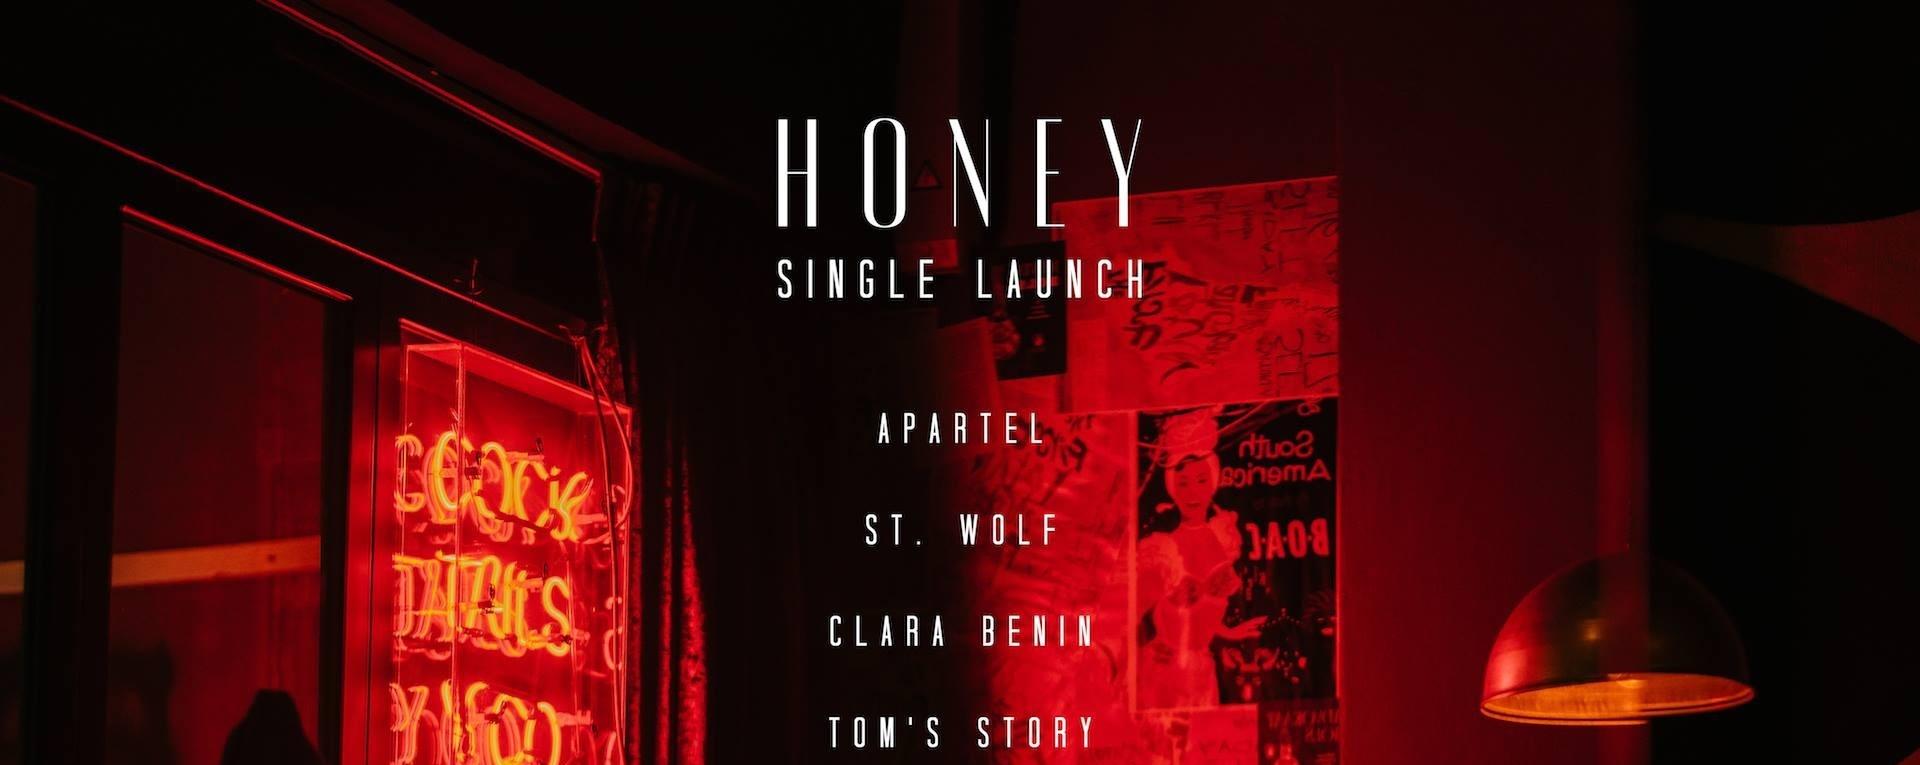 Honey Single Launch